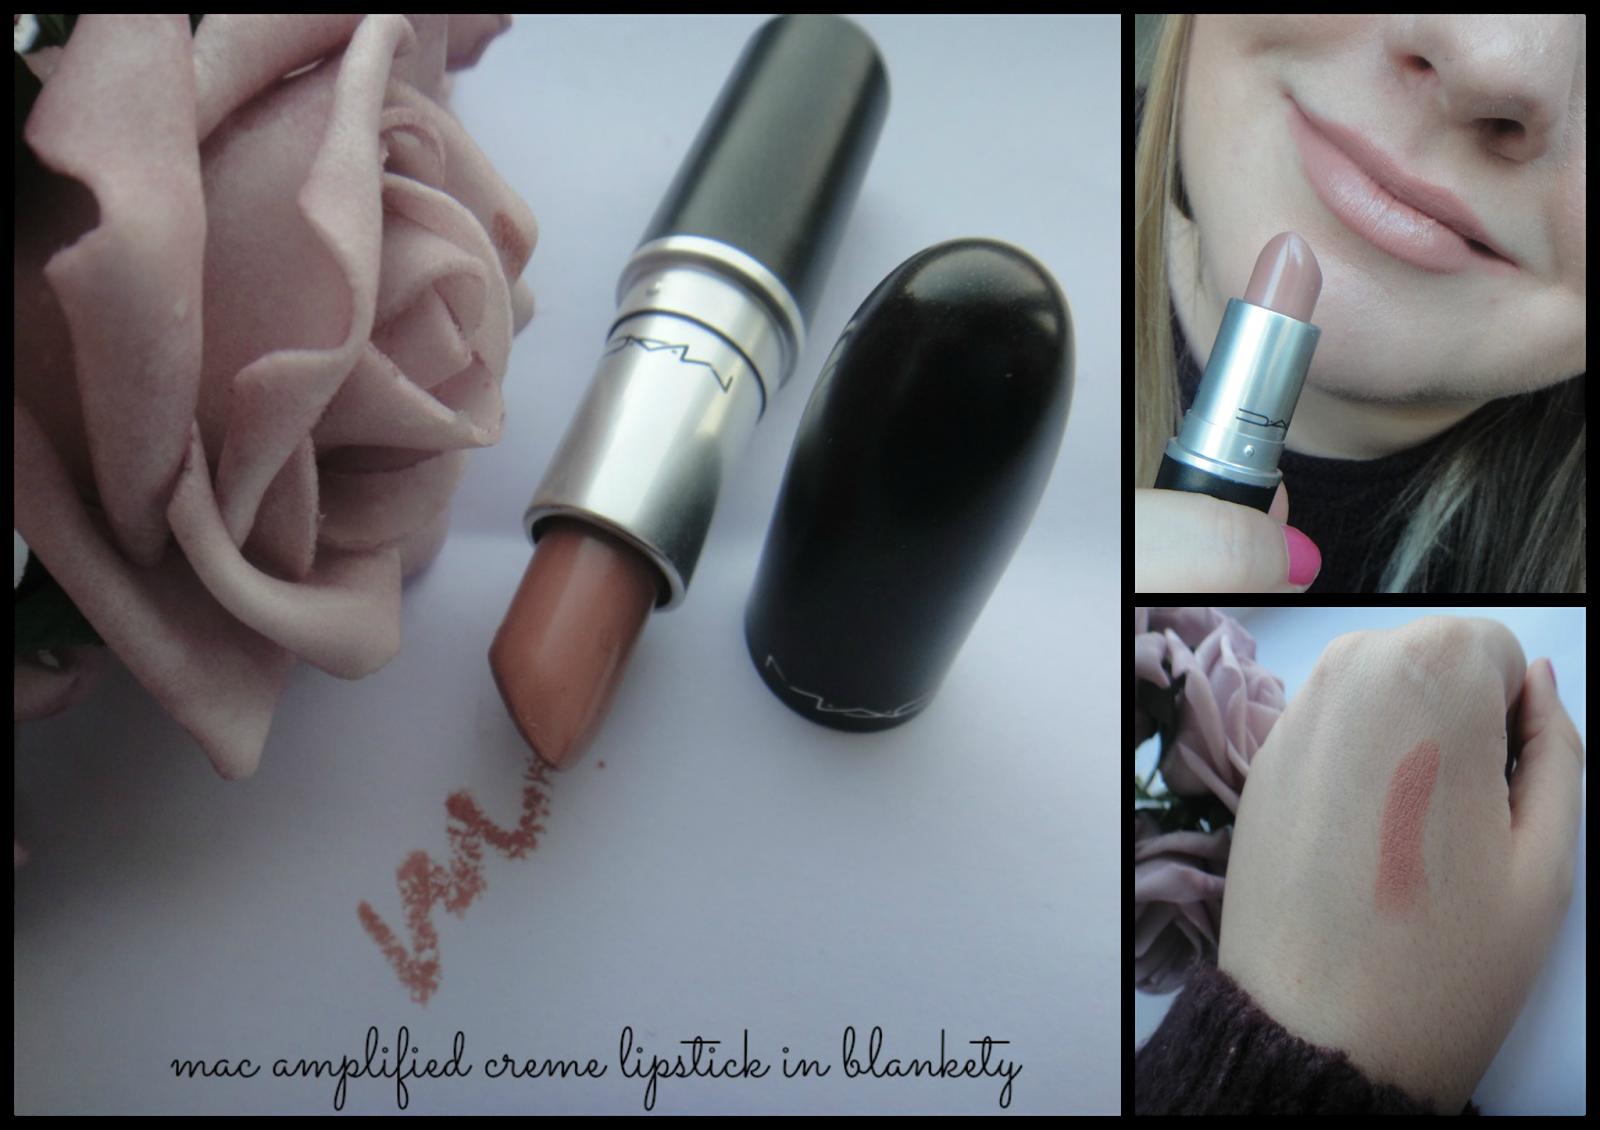 Emily & Han xo: Mac Amplified Creme Lipstick in Blankety ...